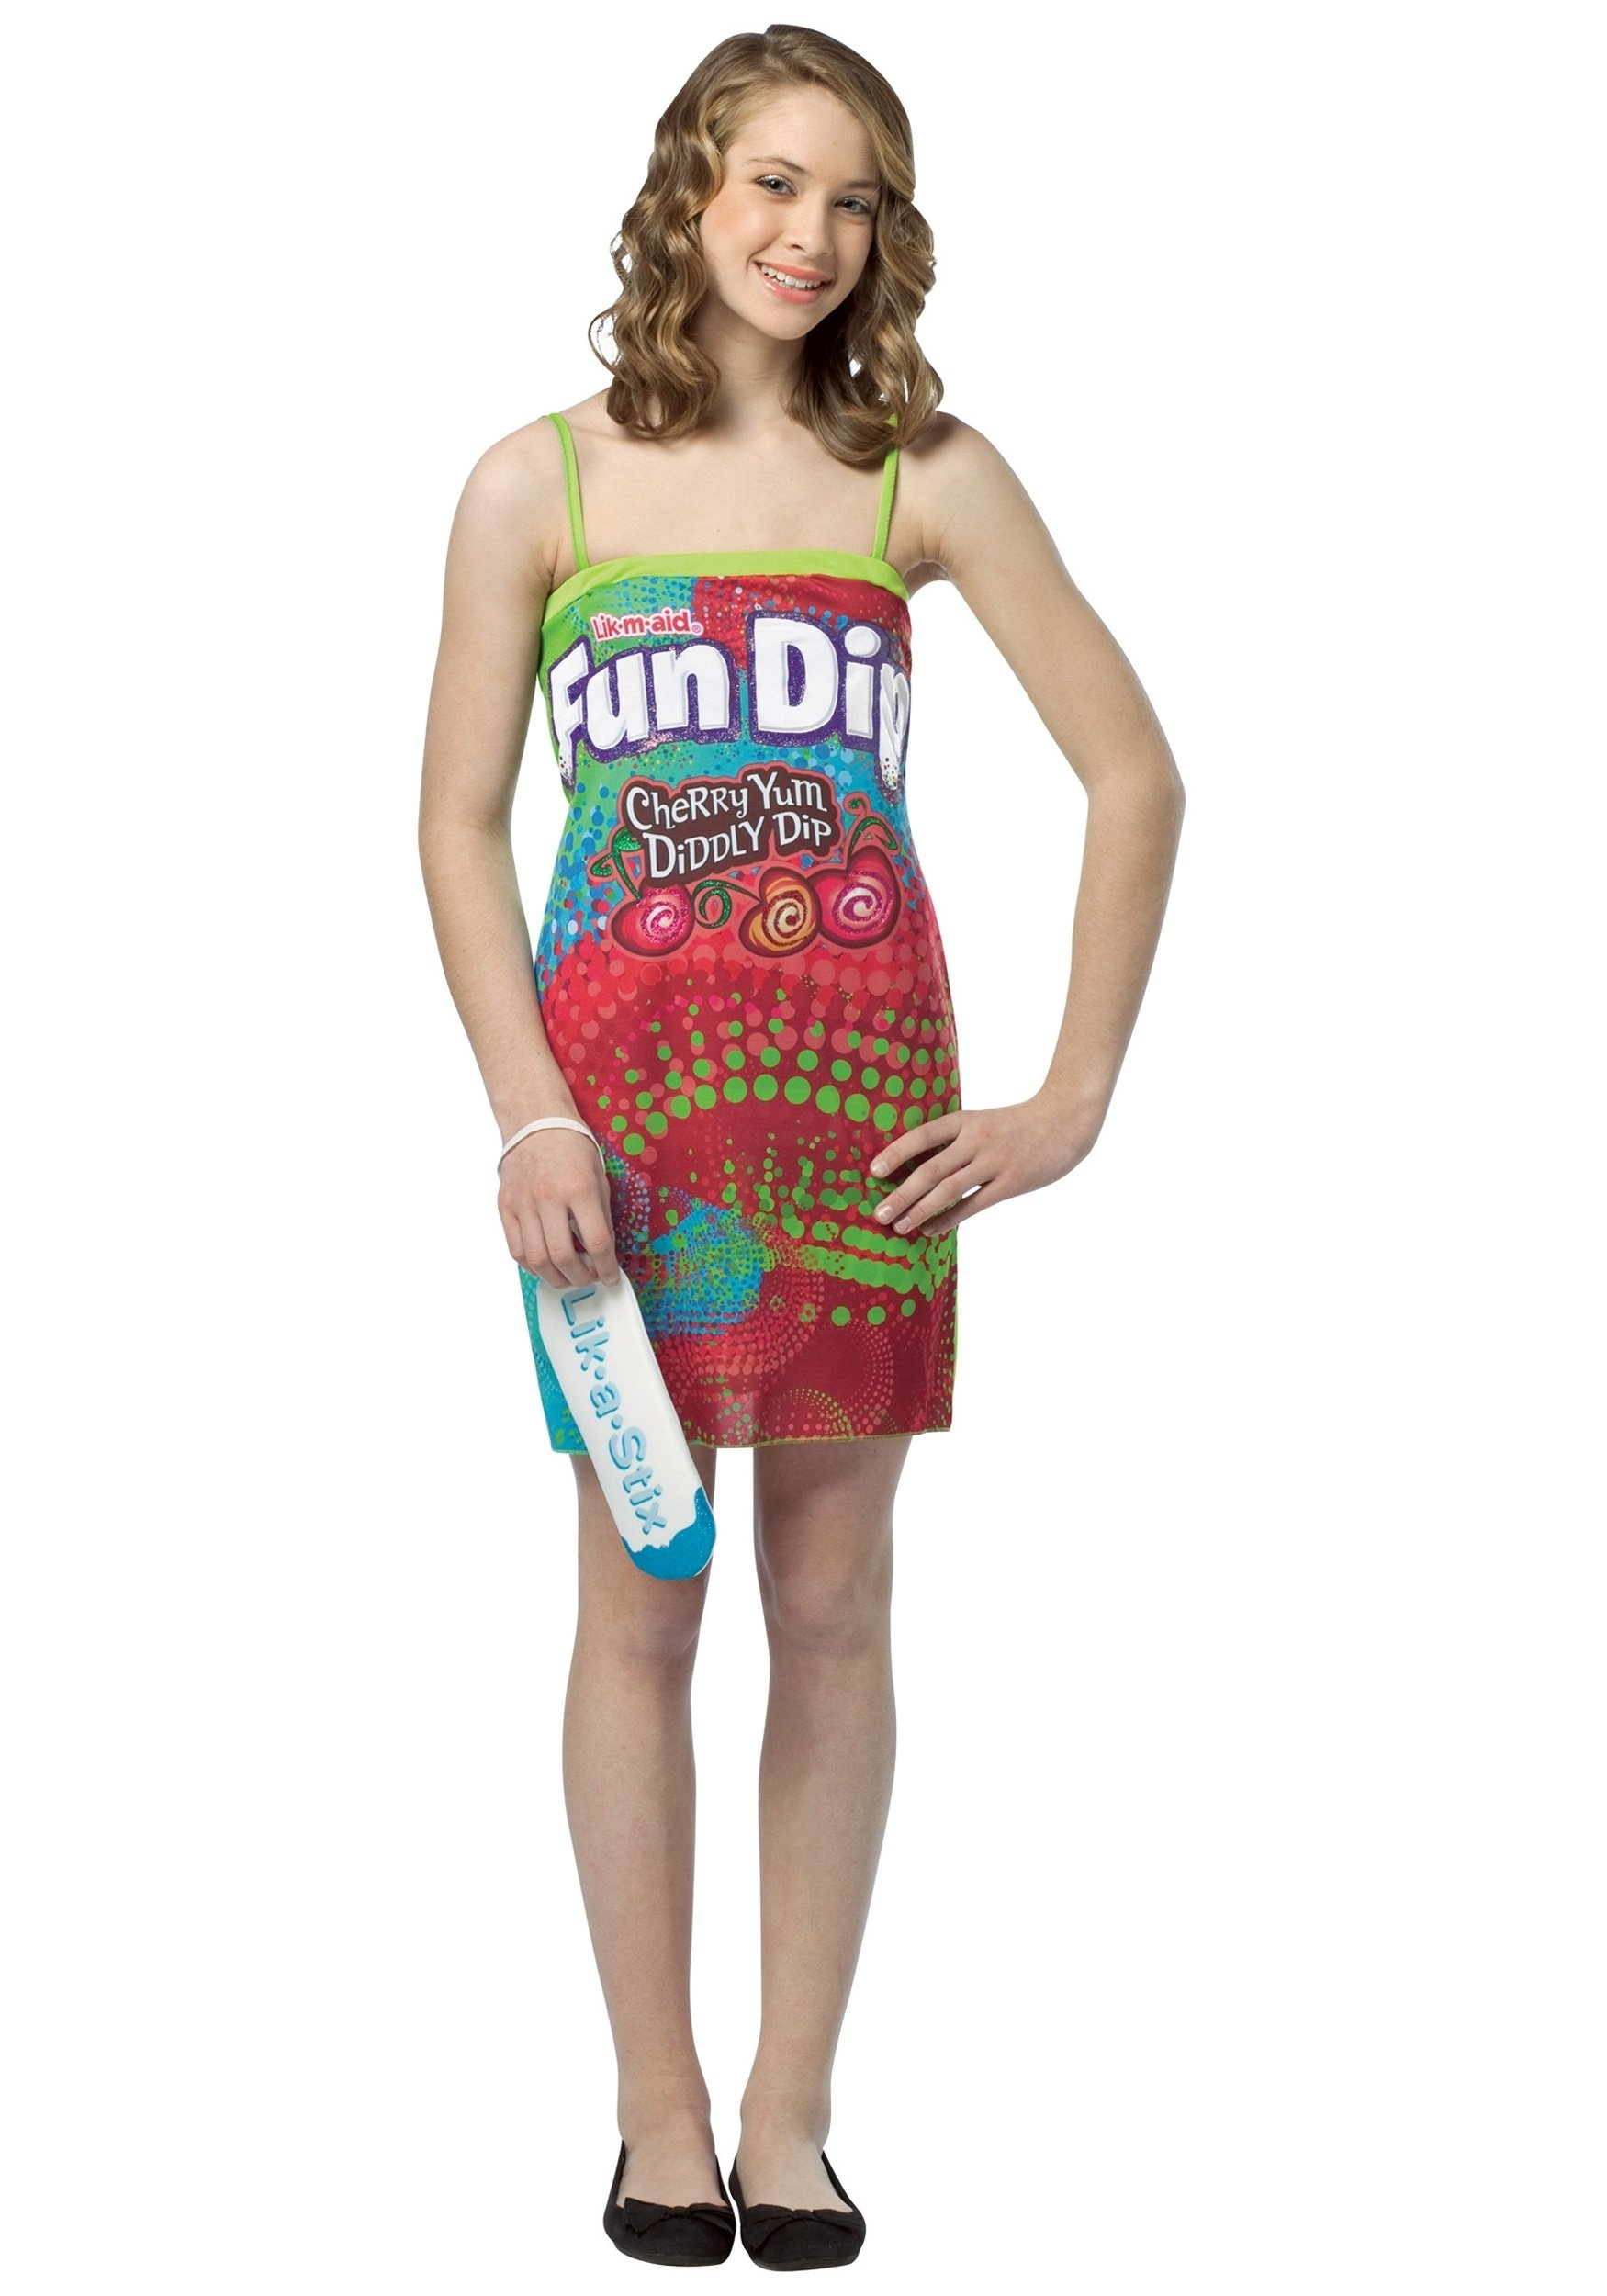 10 Great Teenage Girl Costume Ideas Halloween teen fun dip dress halloween pinterest teen fun fun dip and 6 2021